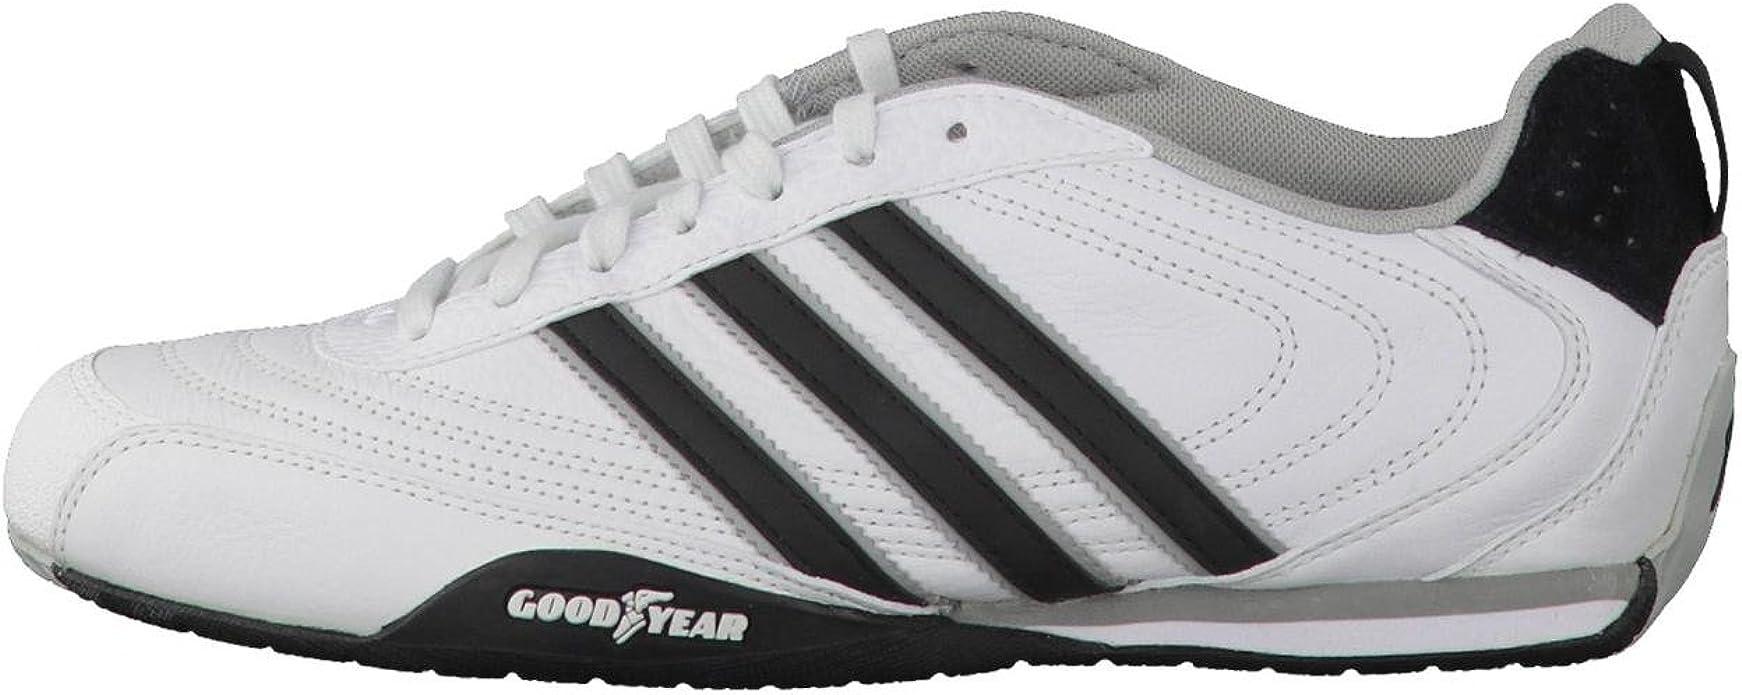 Adidas Goodyear Street 012043 Mens - - : Amazon.de: Shoes & Bags